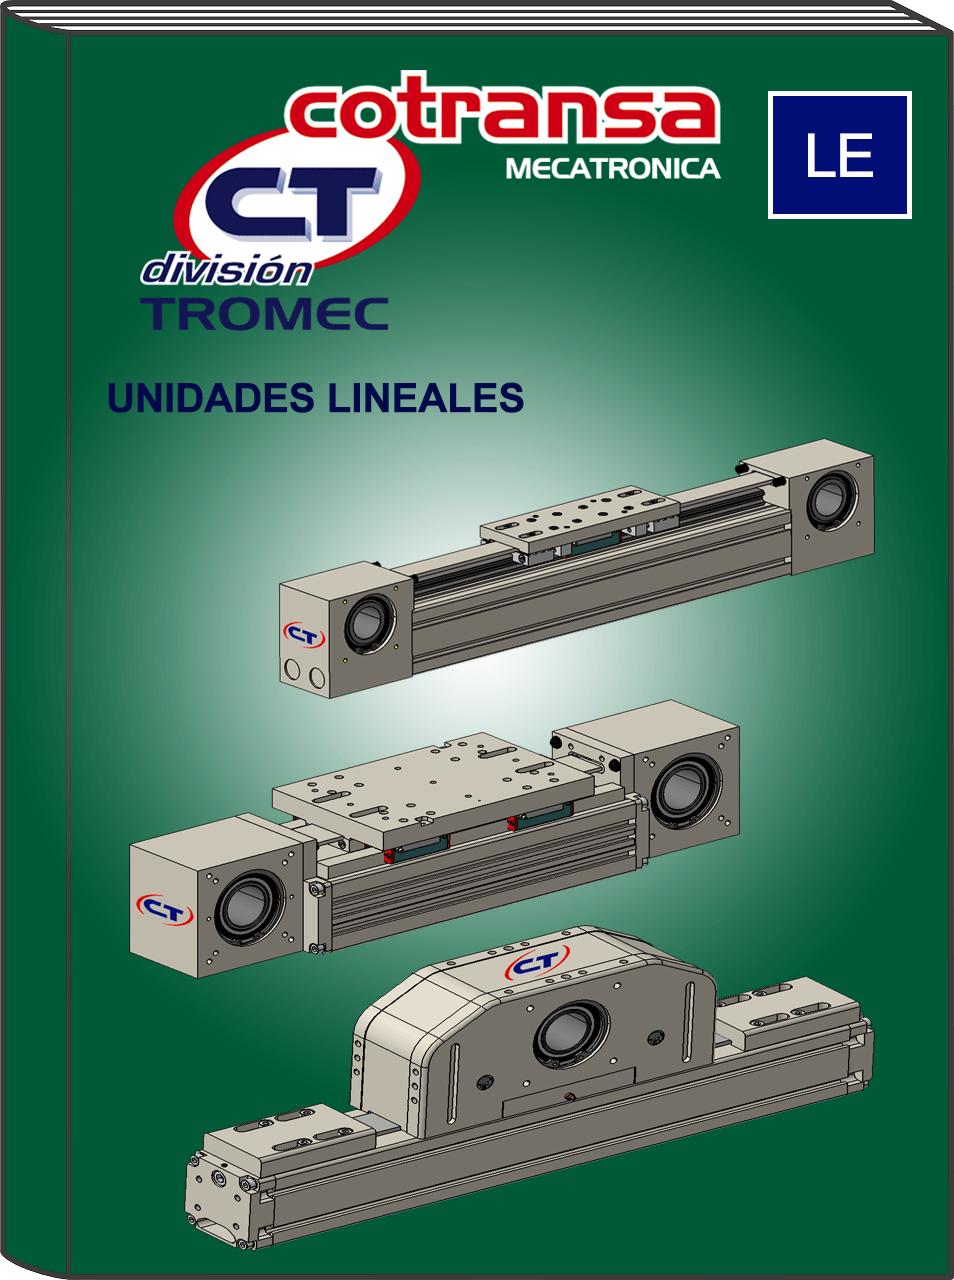 Catálogo LE